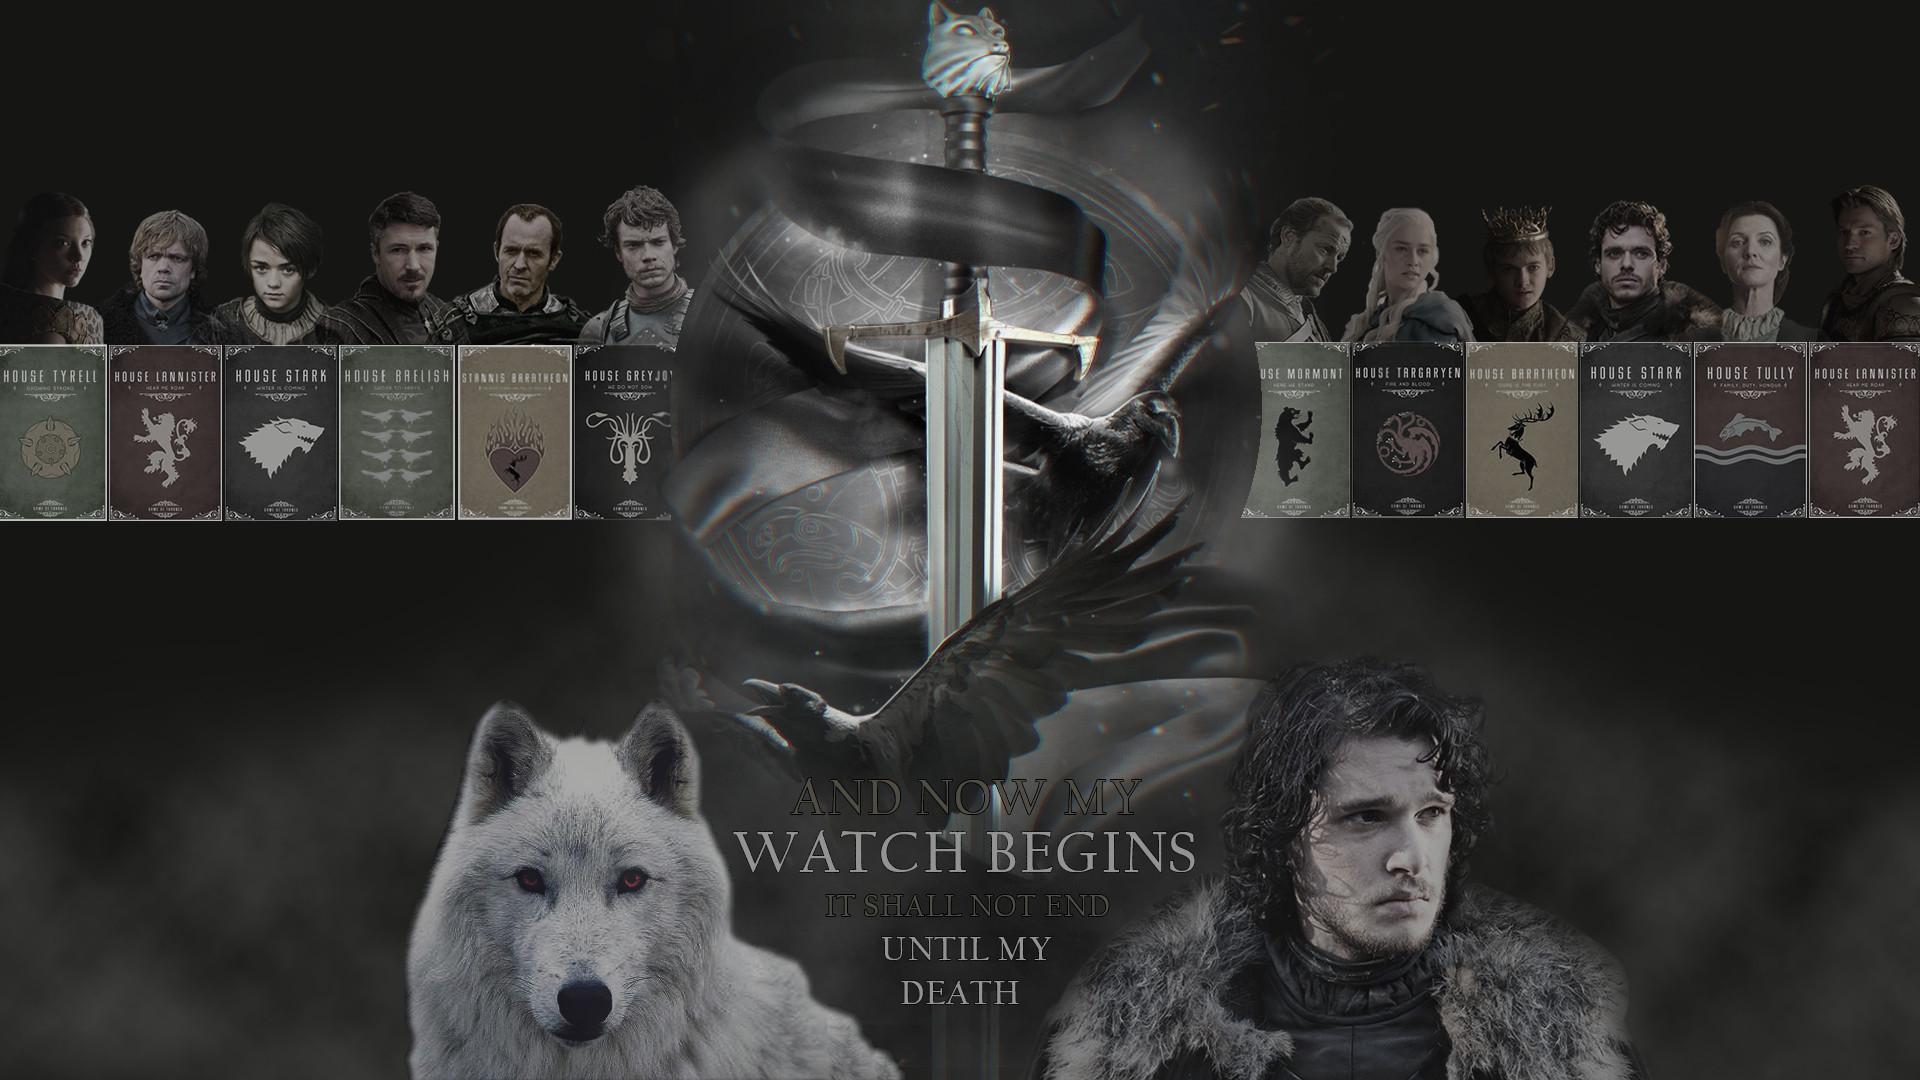 download Download Game Of Thrones Season 3 Movie Wallpaper 1920x1080